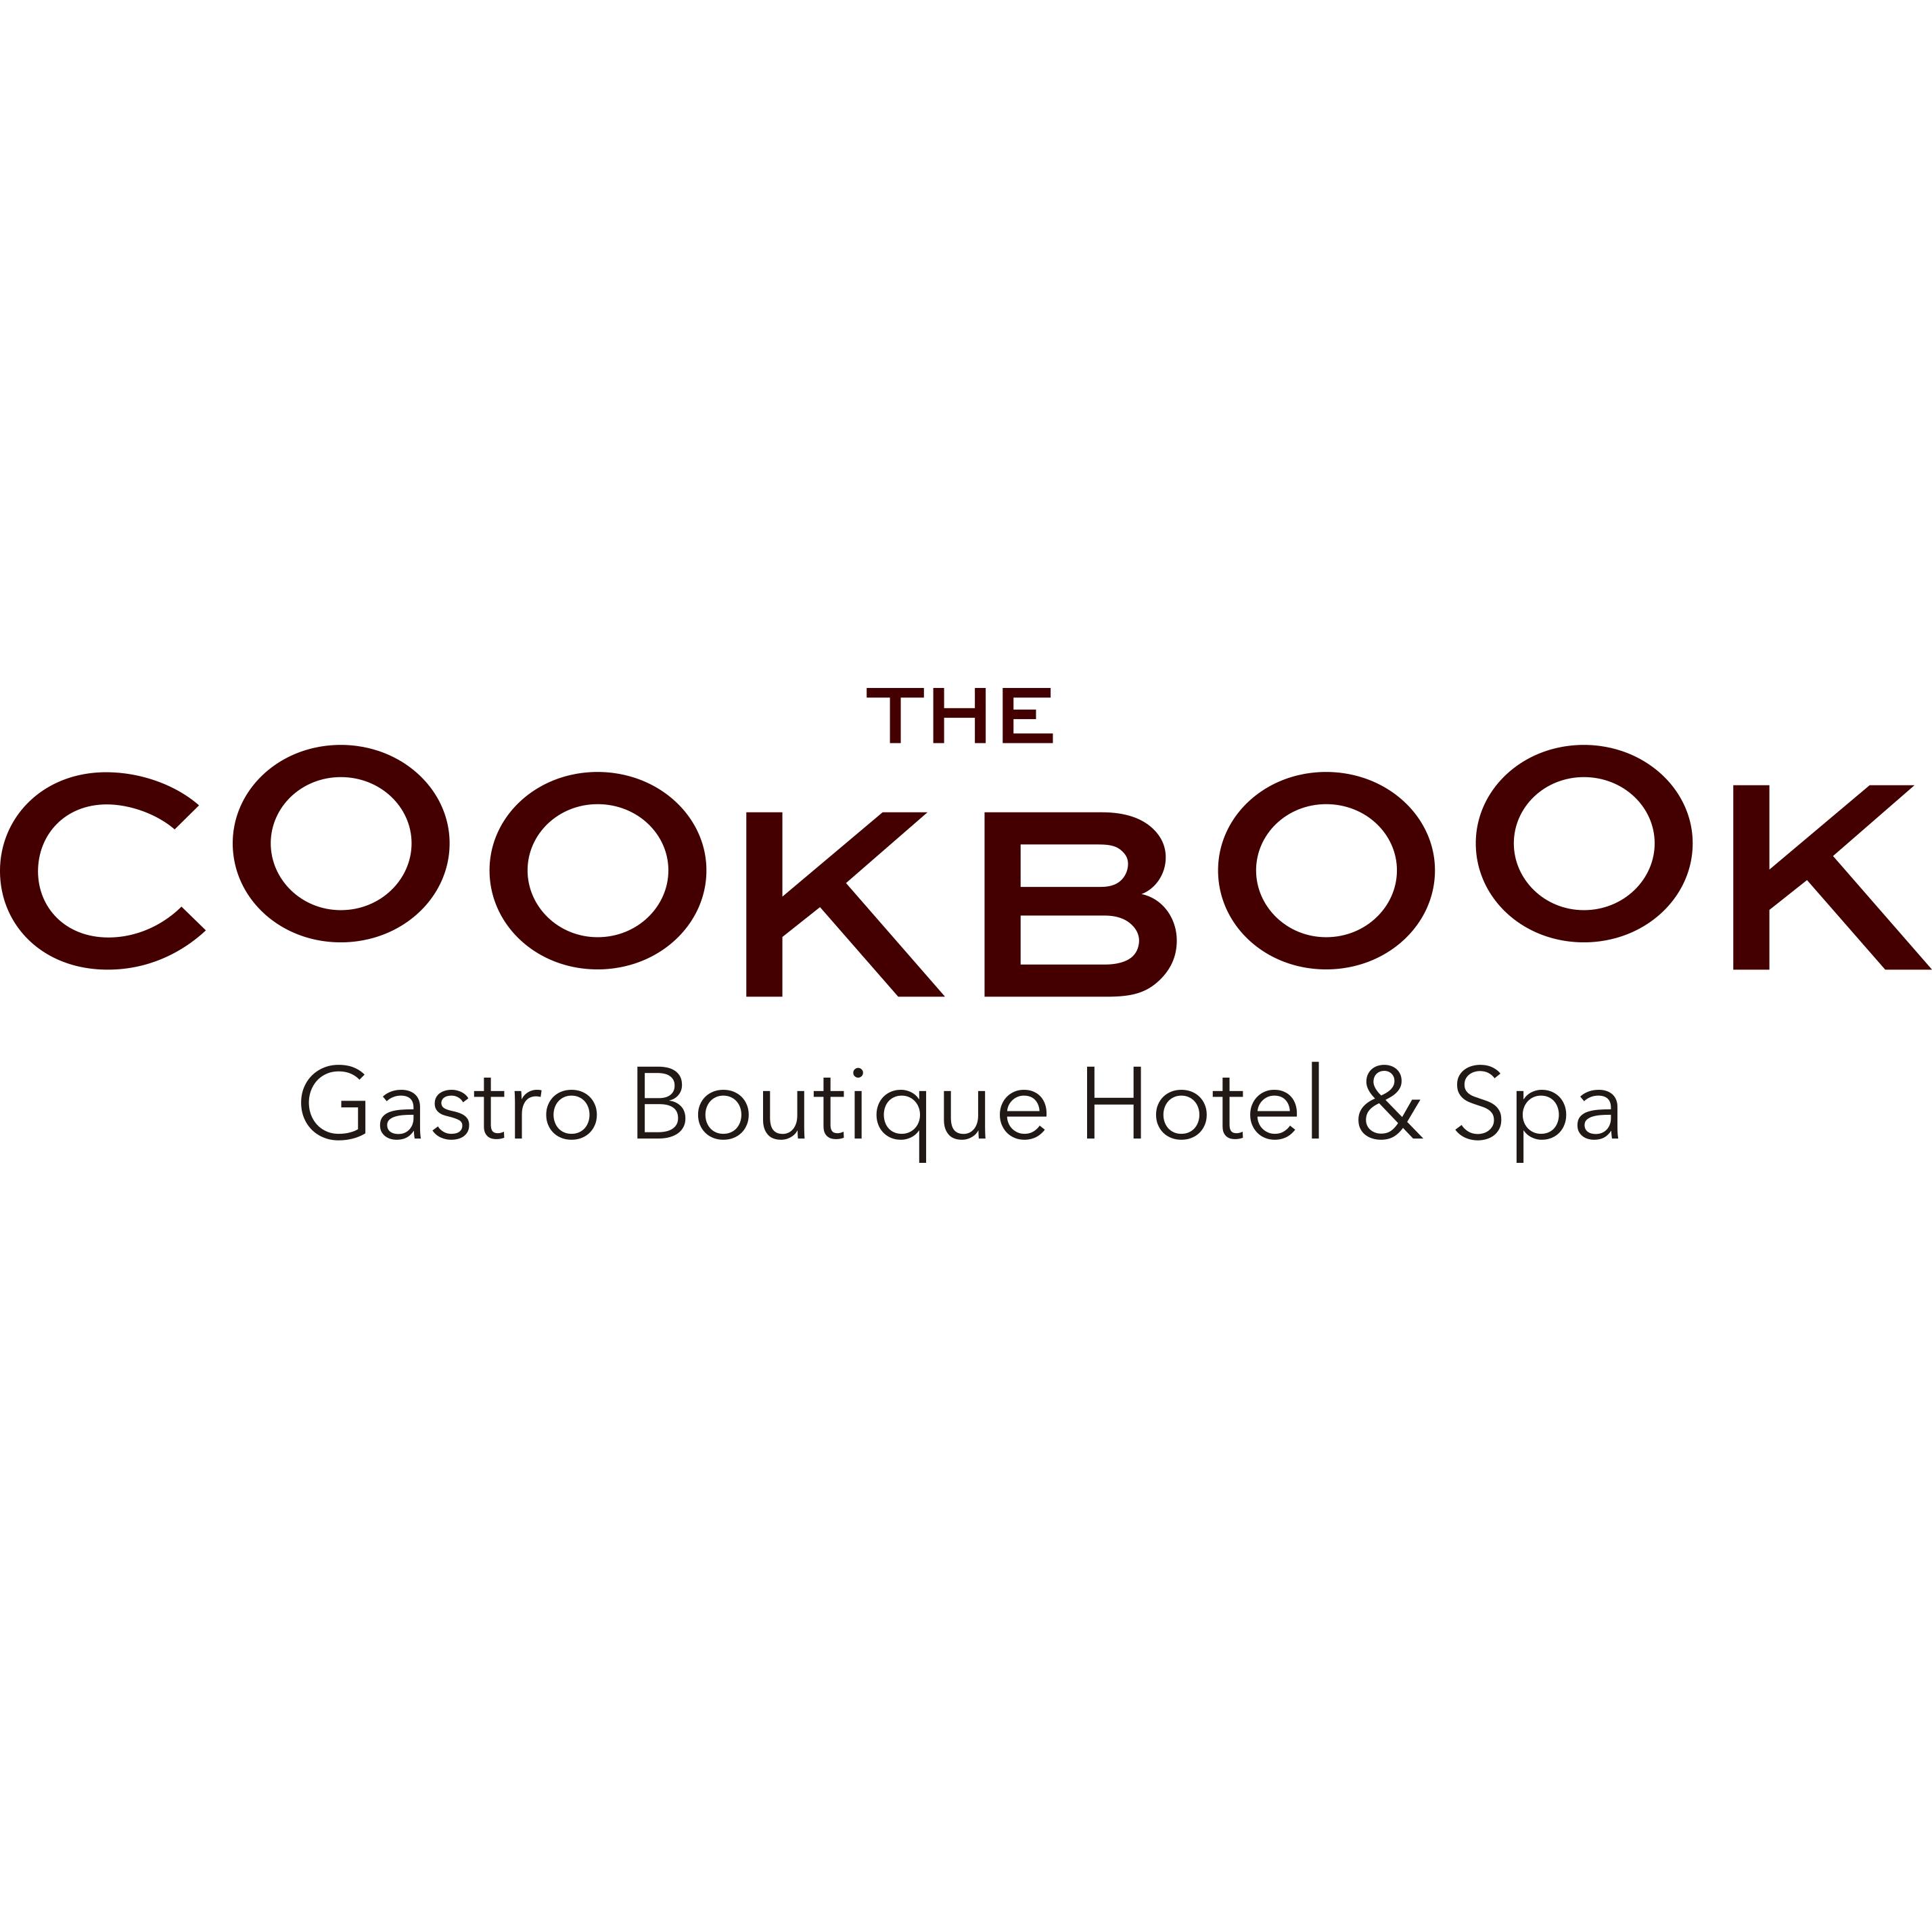 The Cookbook Hotel